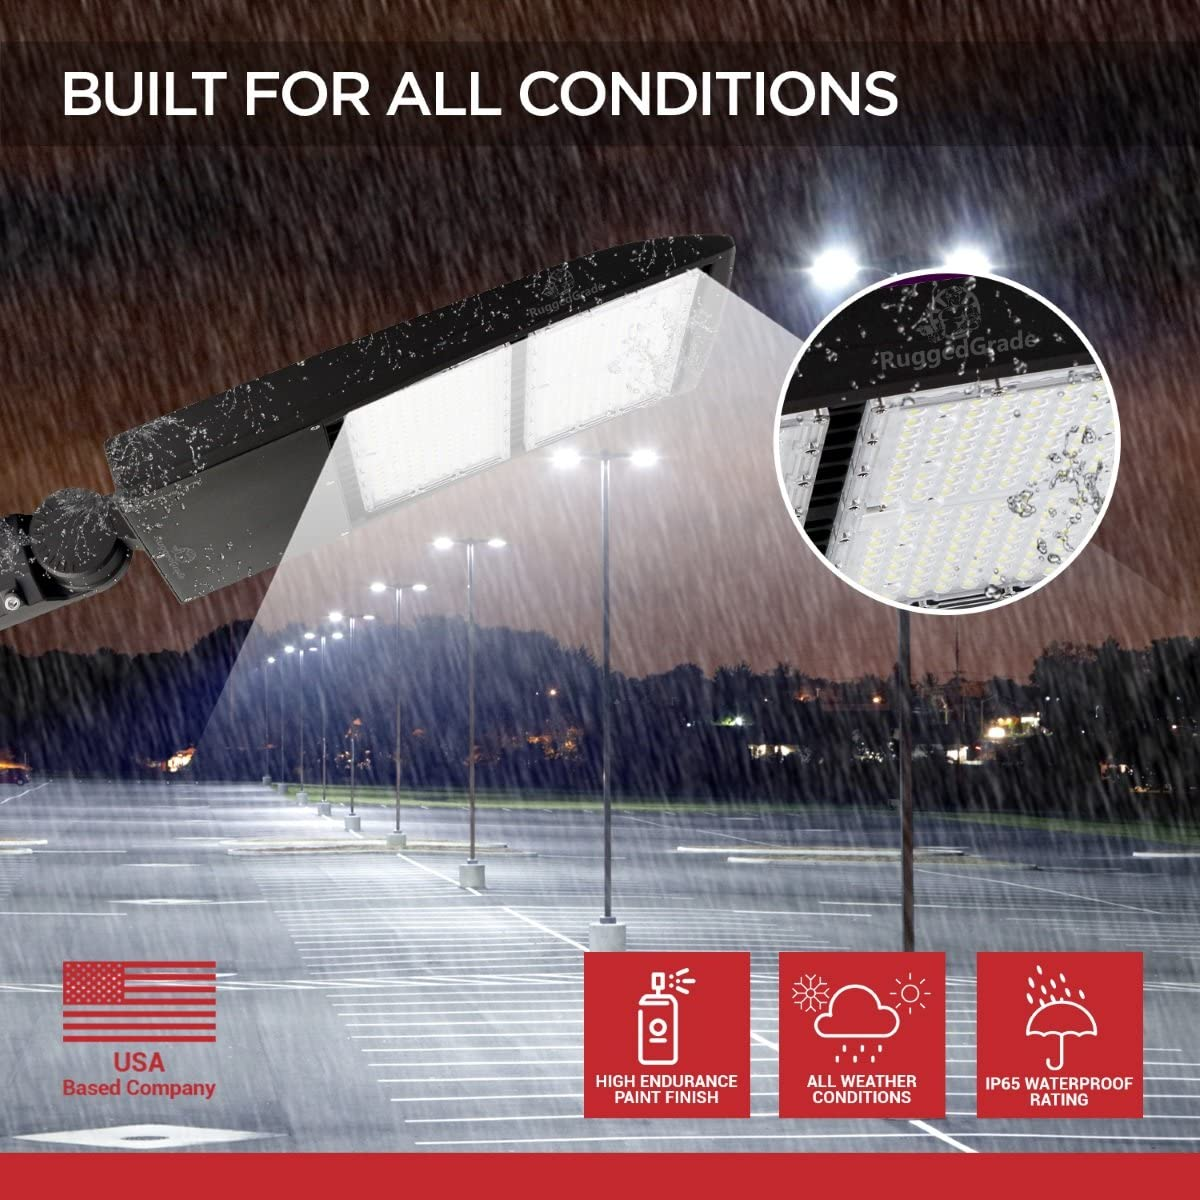 300 Watt NextGen II LED Parking Lot Lights NO photocell Slip Fit Mount Replaces 1000W Halide Super Efficiency 135 Lumen to Watt 5000K Bright White LED Shoebox Lights 40,500 Lumen